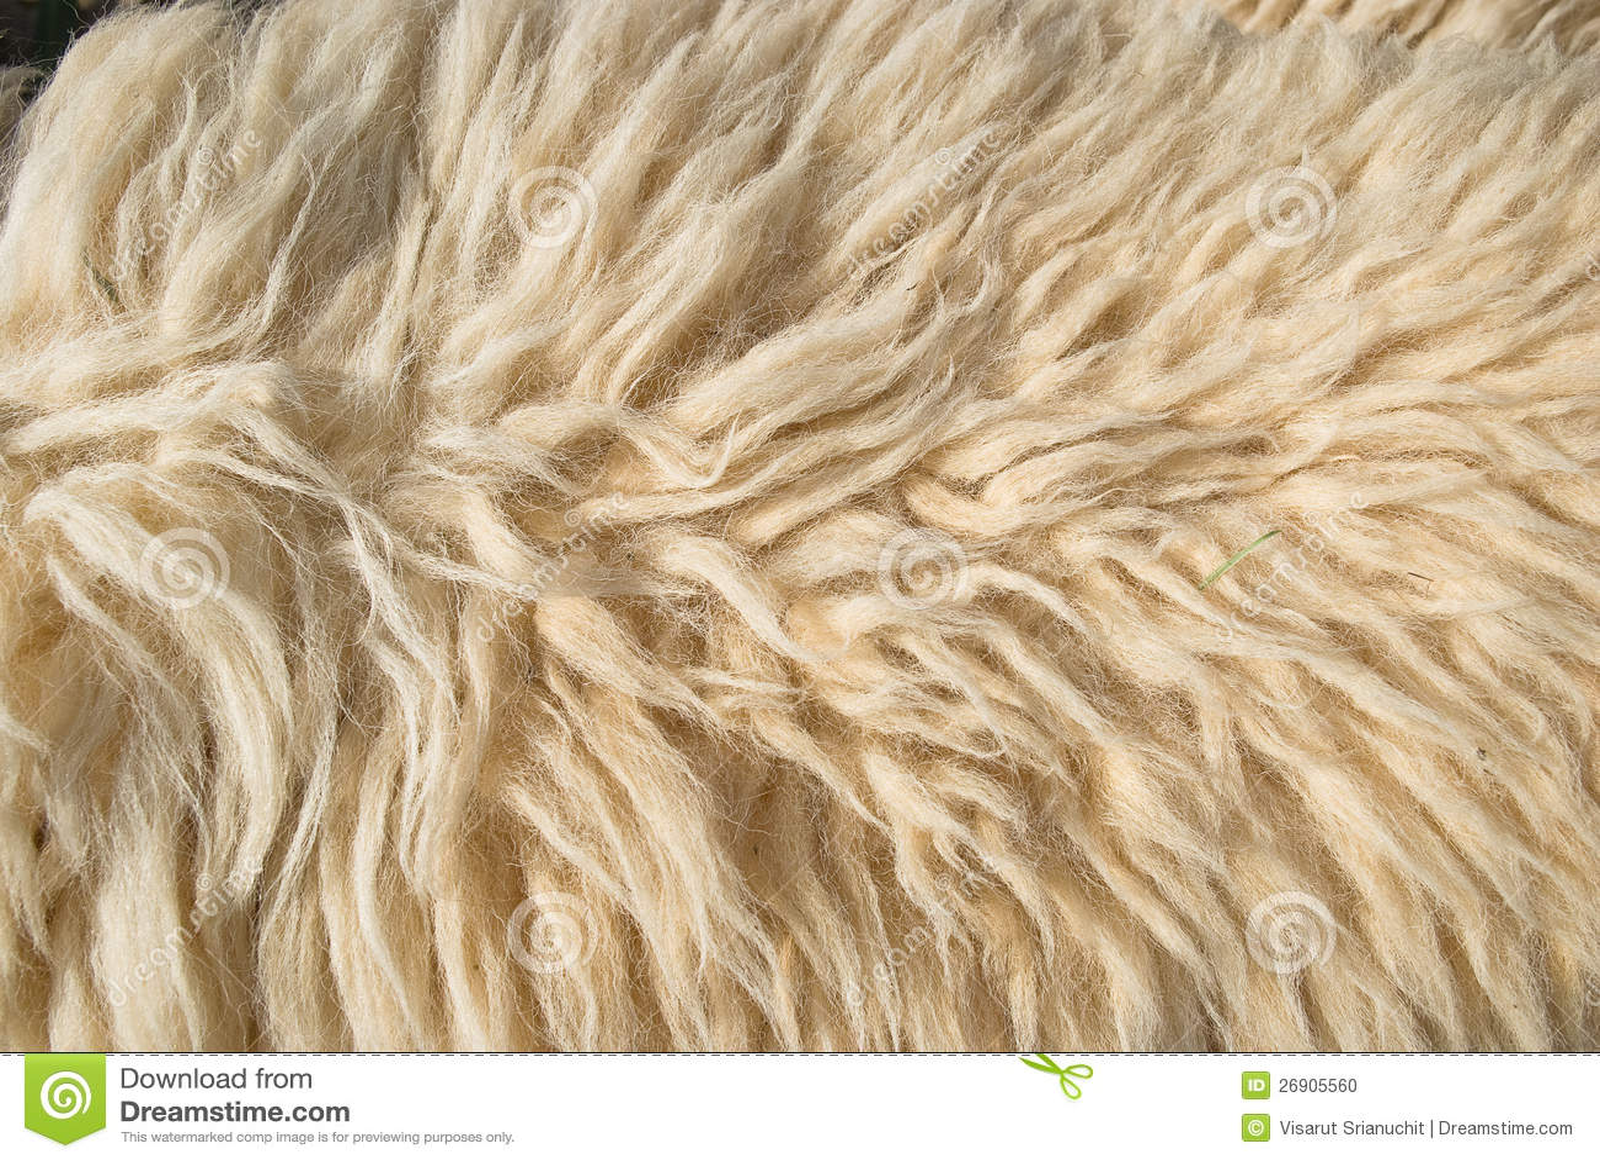 White Sheep Wool Stock Photo Image Of Close Fluffy